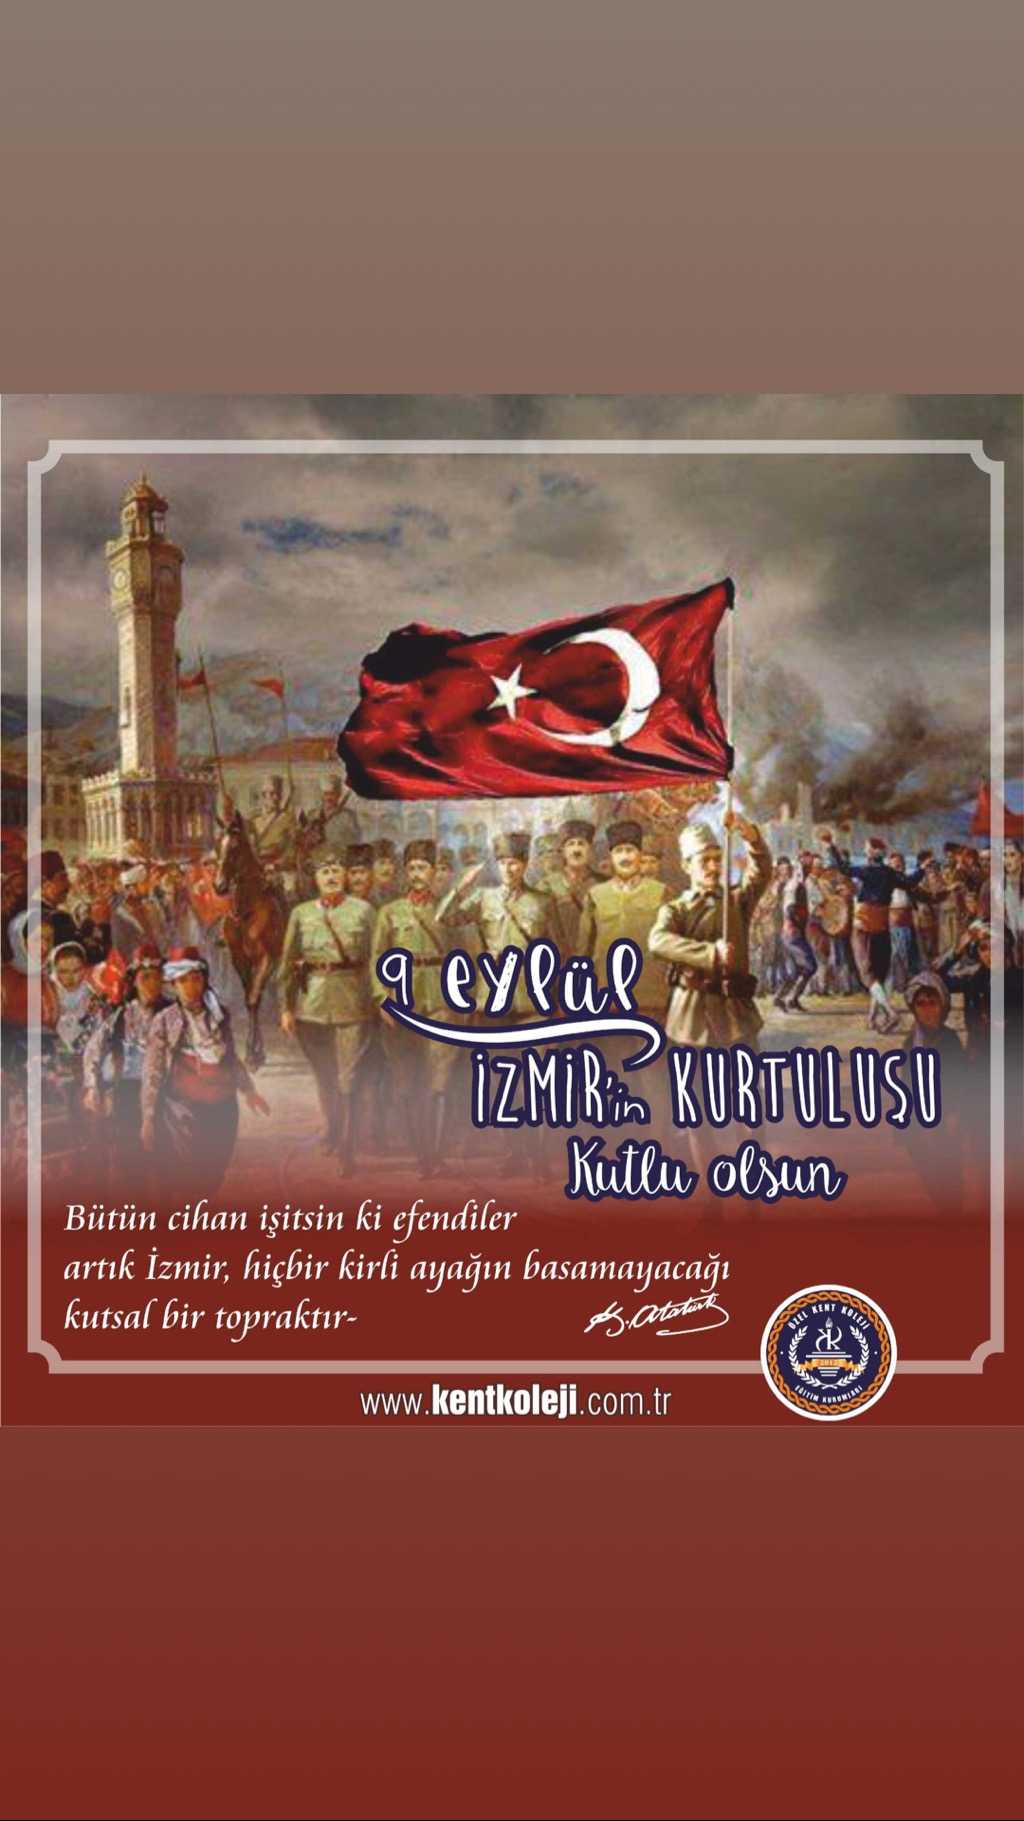 9 Eylül İzmirin Kurtuluşu Kutlu Olsun